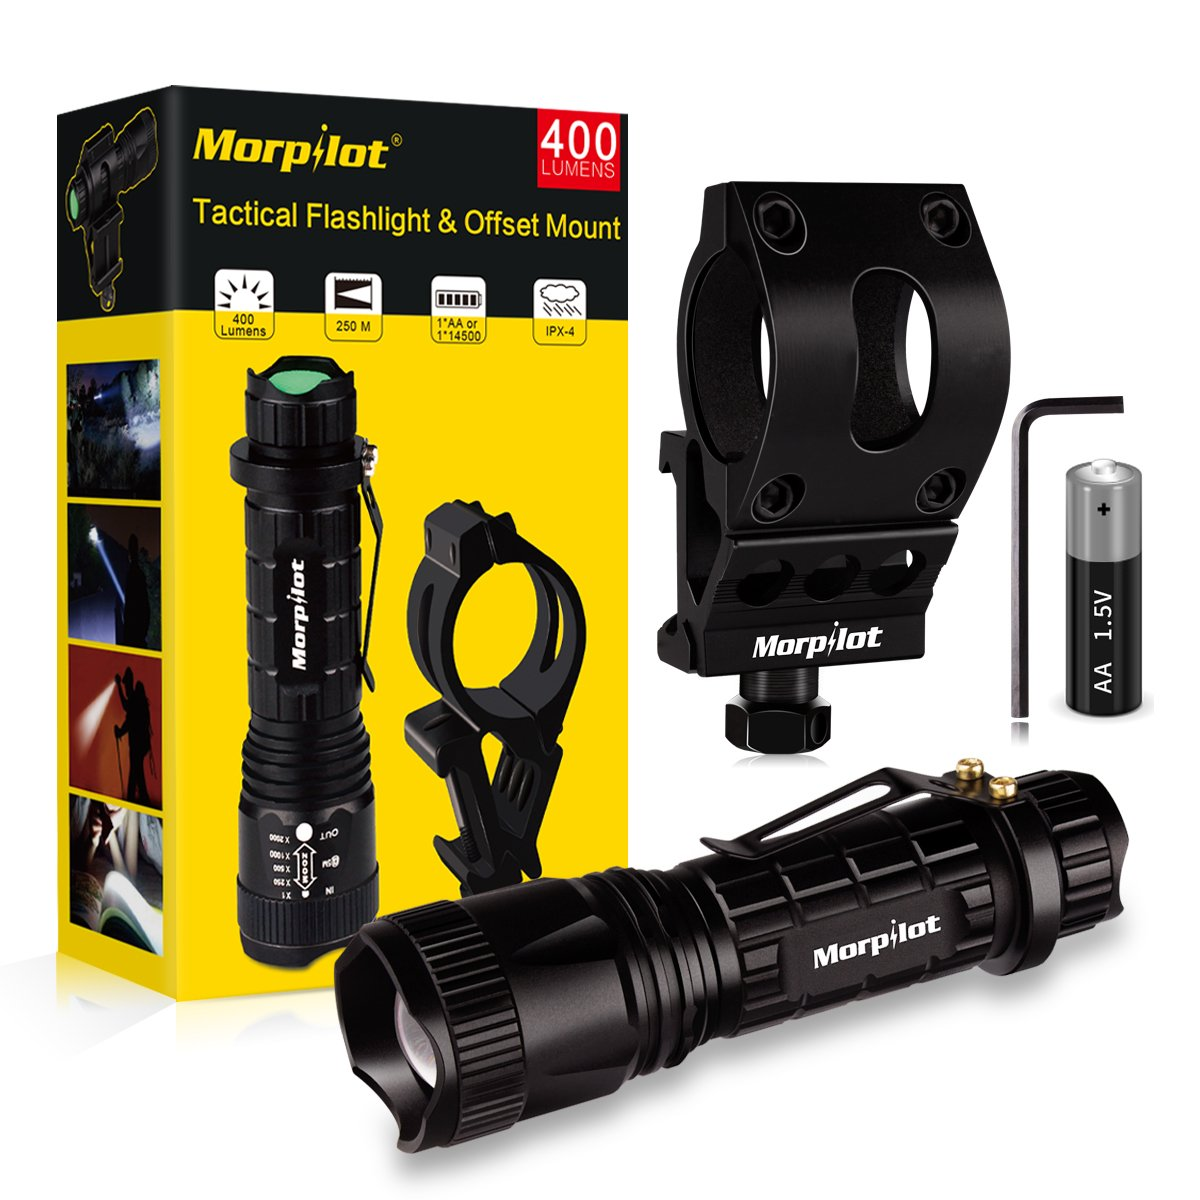 Morpilot Flashlight Mount Rail Mount Flashlight Picatinny Flashlight, 5 Modes 400LM Tactical Flashlight Offset Mount Set, Black